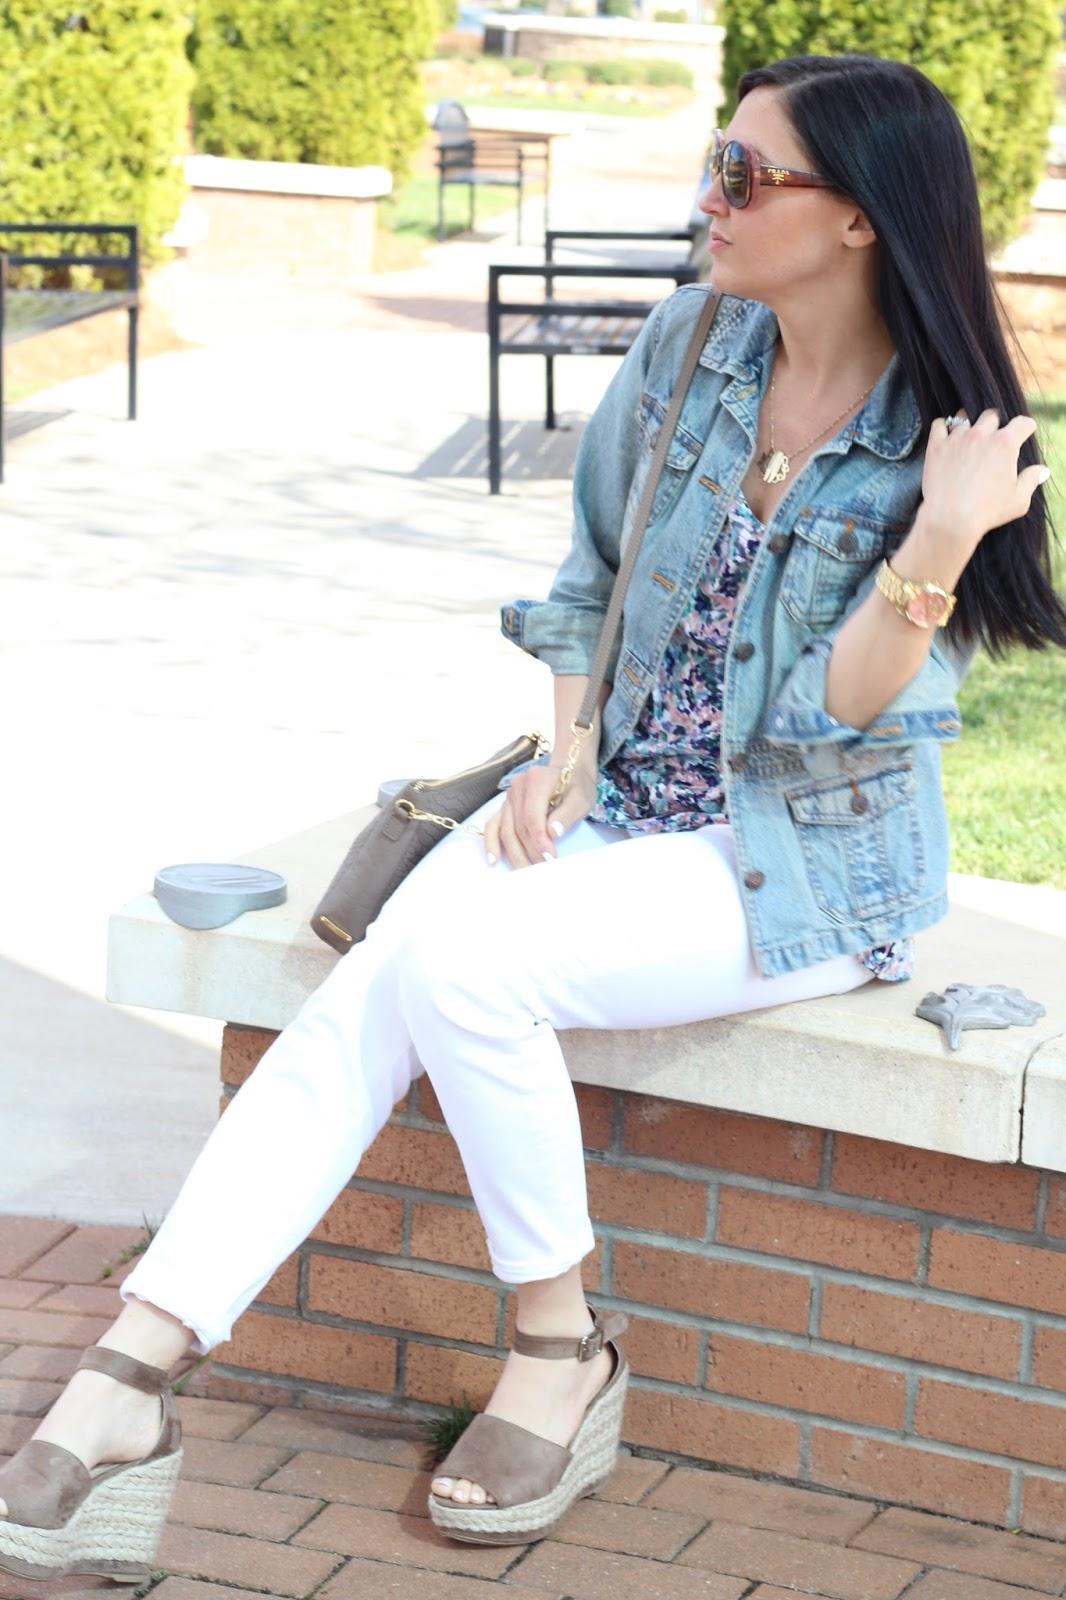 Floral Cold Shoulder, White Skinnies and Denim for Spring, Prada Sunglasses, Espadrilles